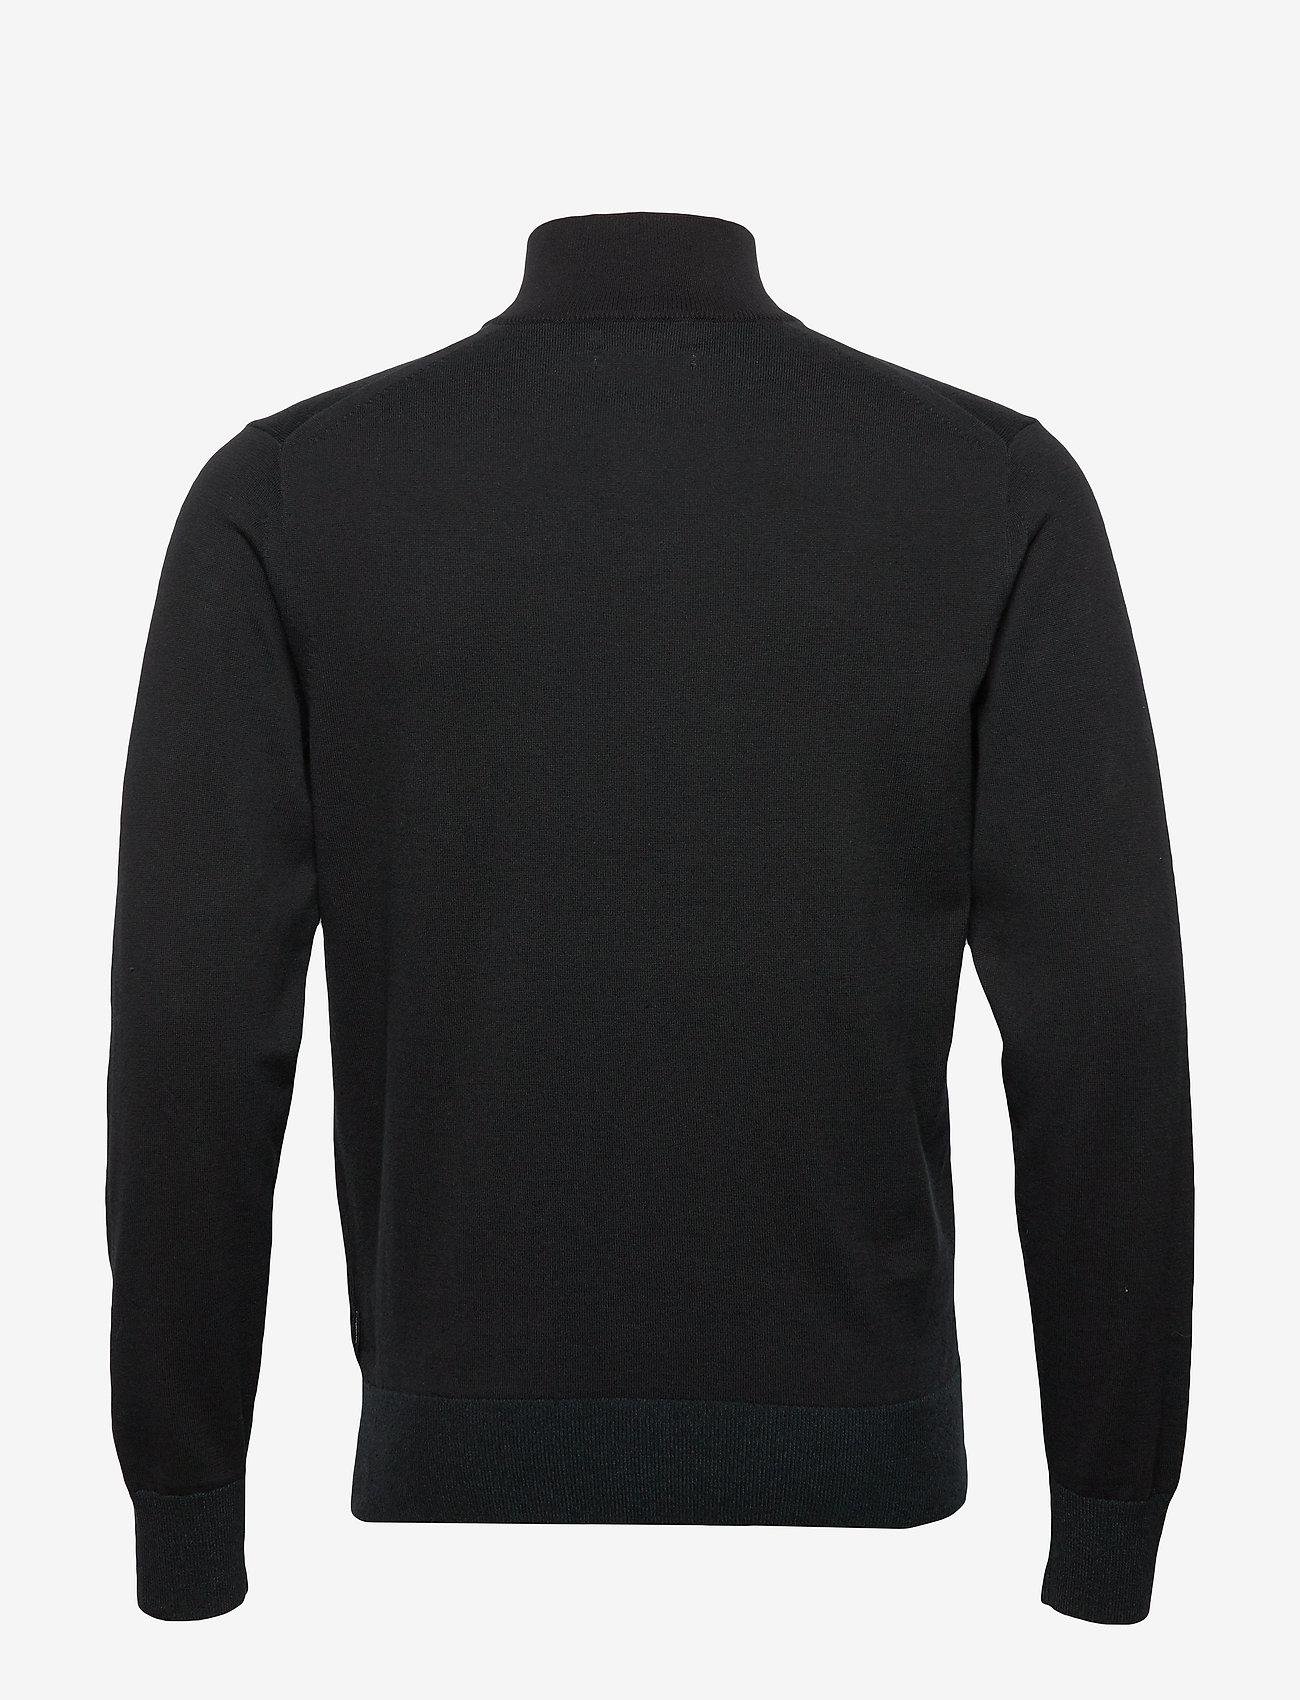 Cotton Silk 1/4 Zip Sweater (Calvin Black) - Calvin Klein eGaQTo